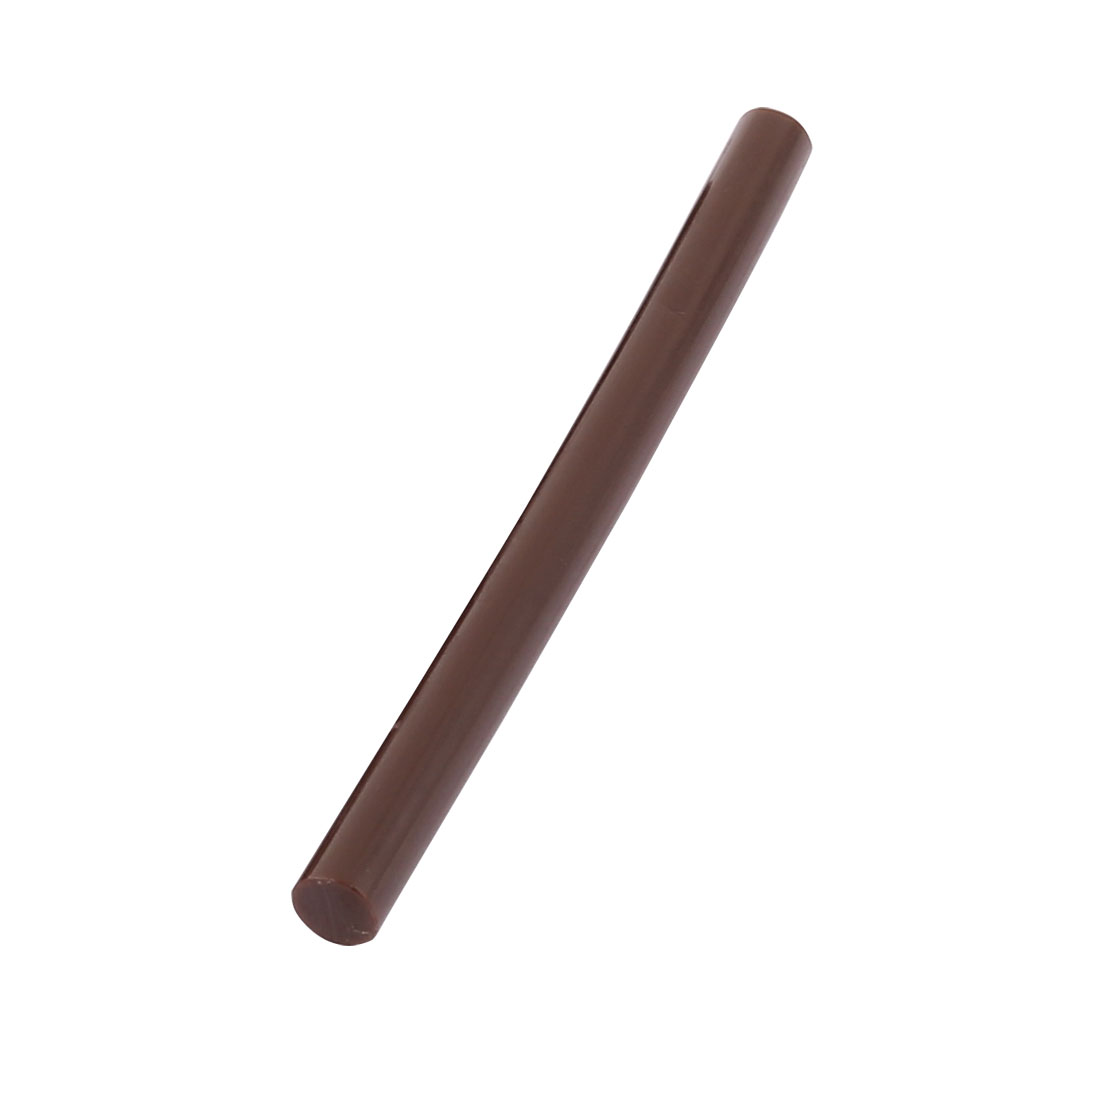 7mm x 100mm Mini Brown Adhesive Hot Melt Glue Sticks For Hot Melt Glue Gun